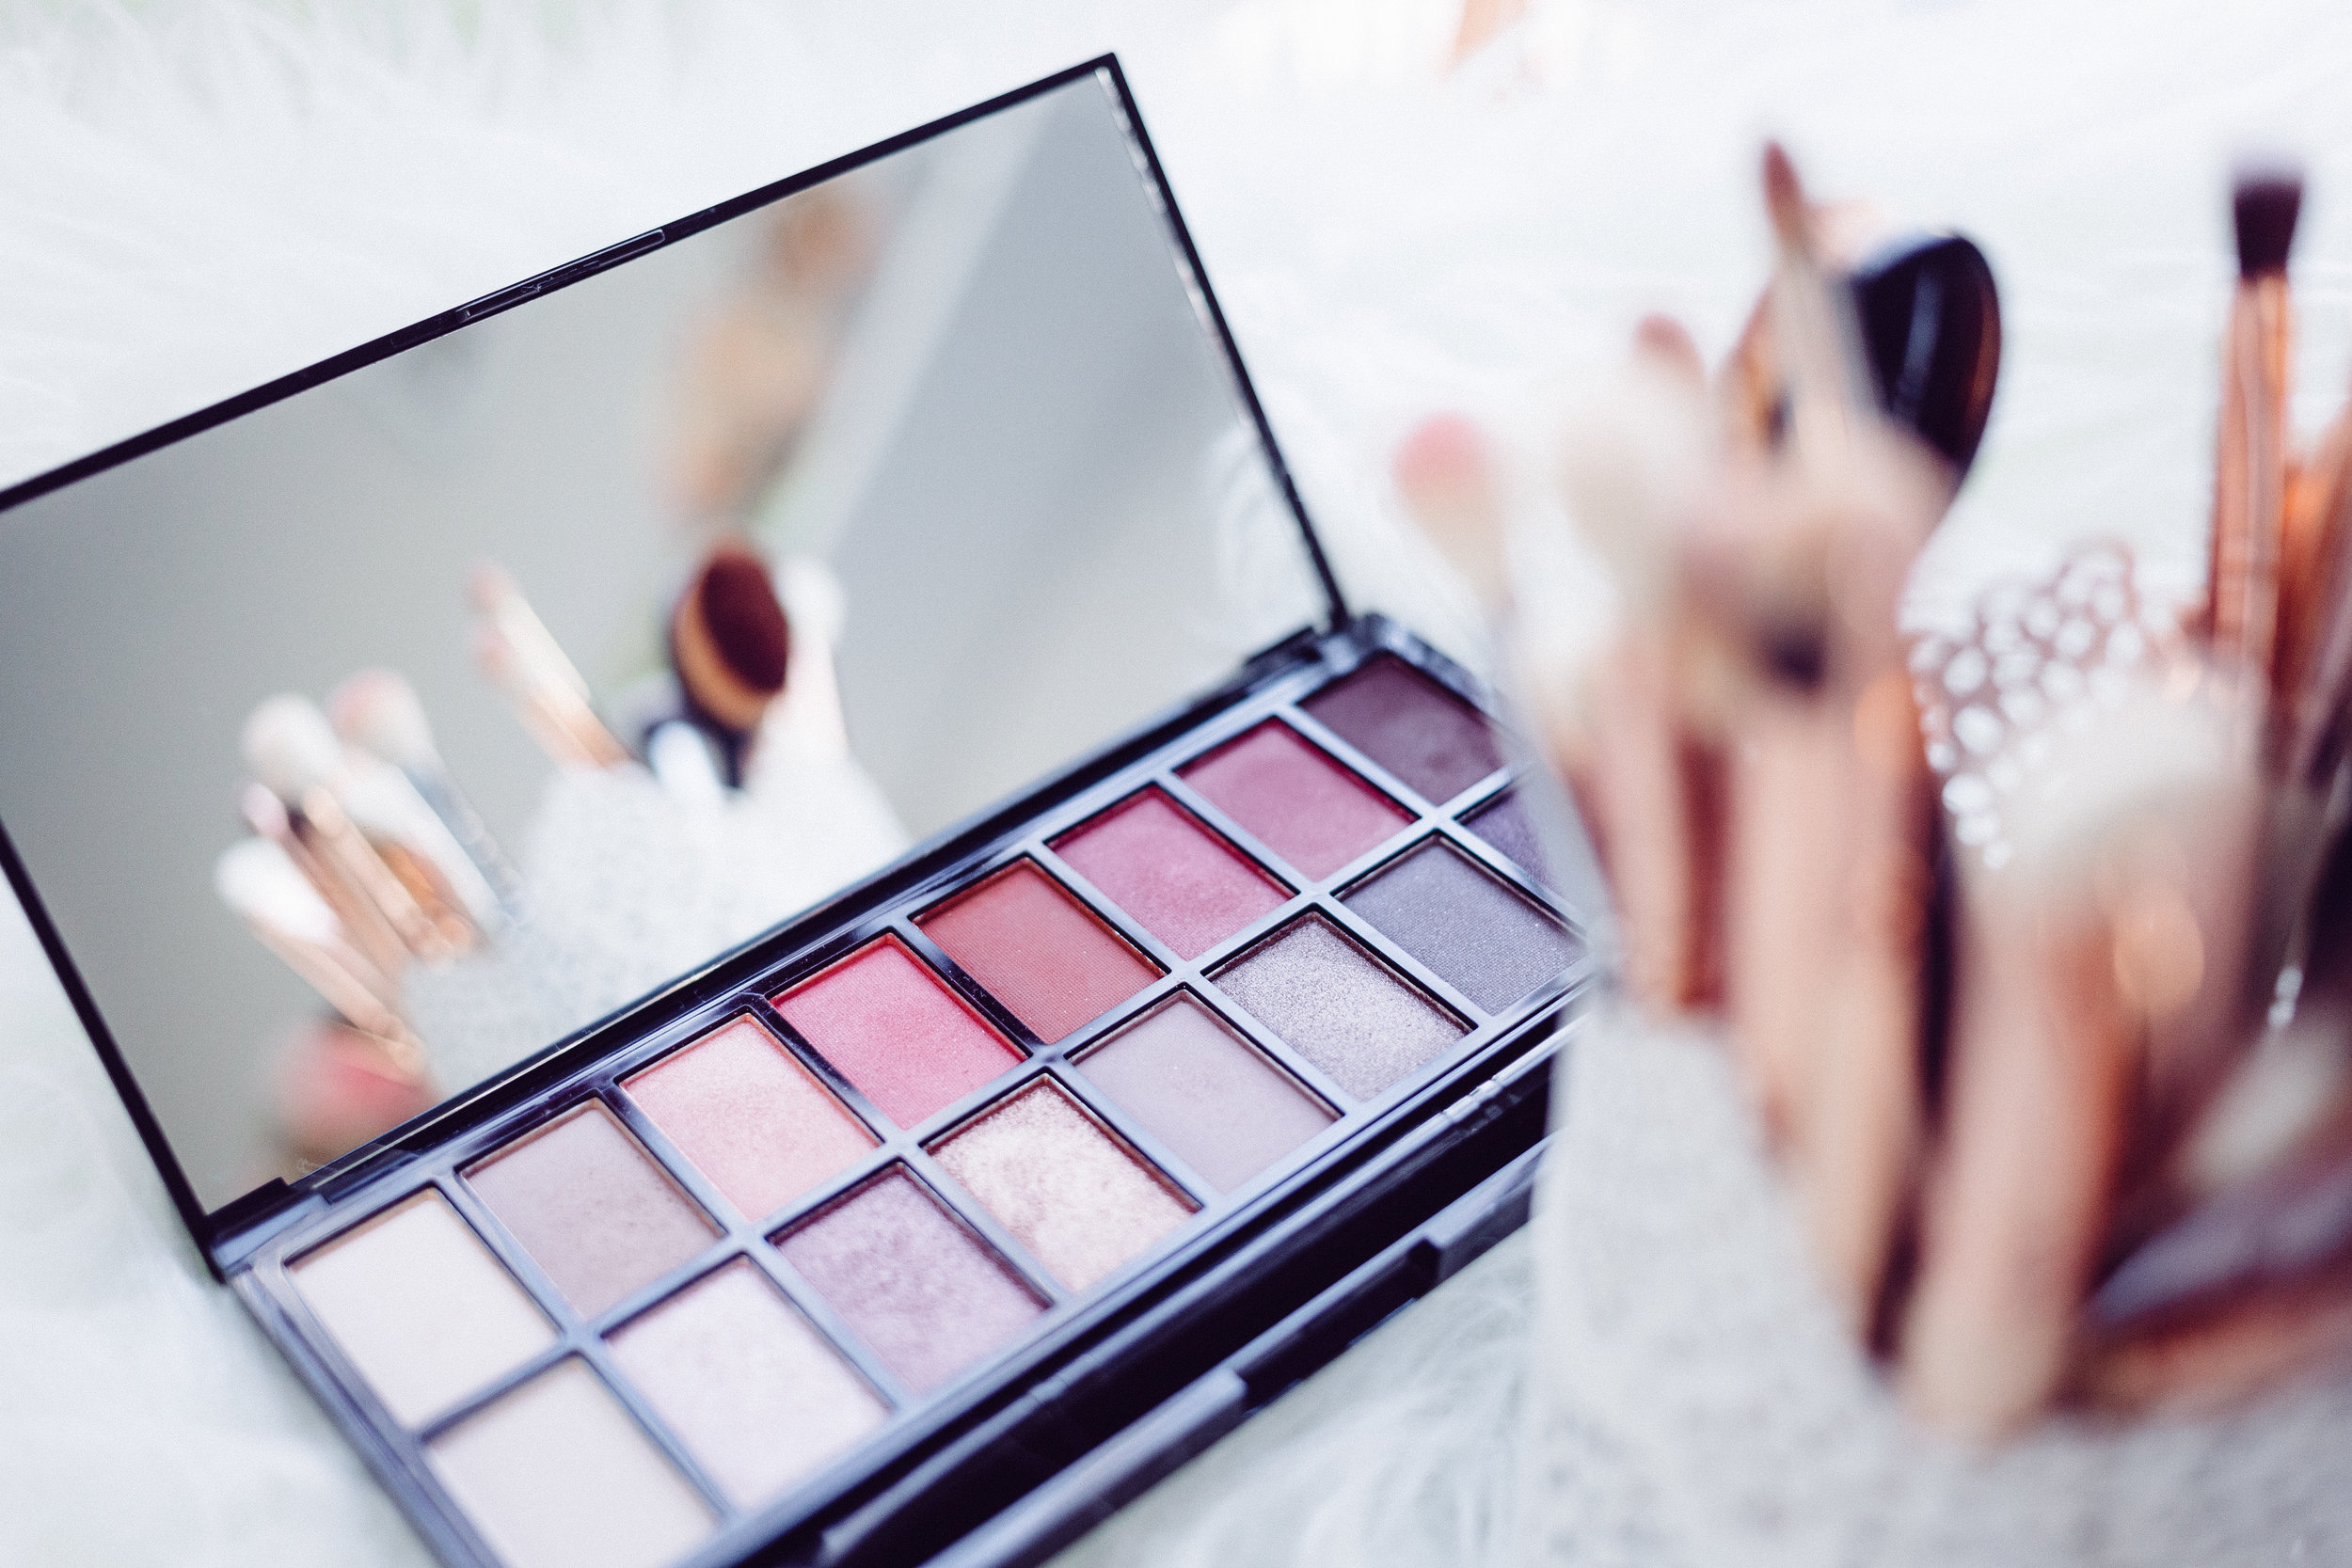 - My makeup tutorials